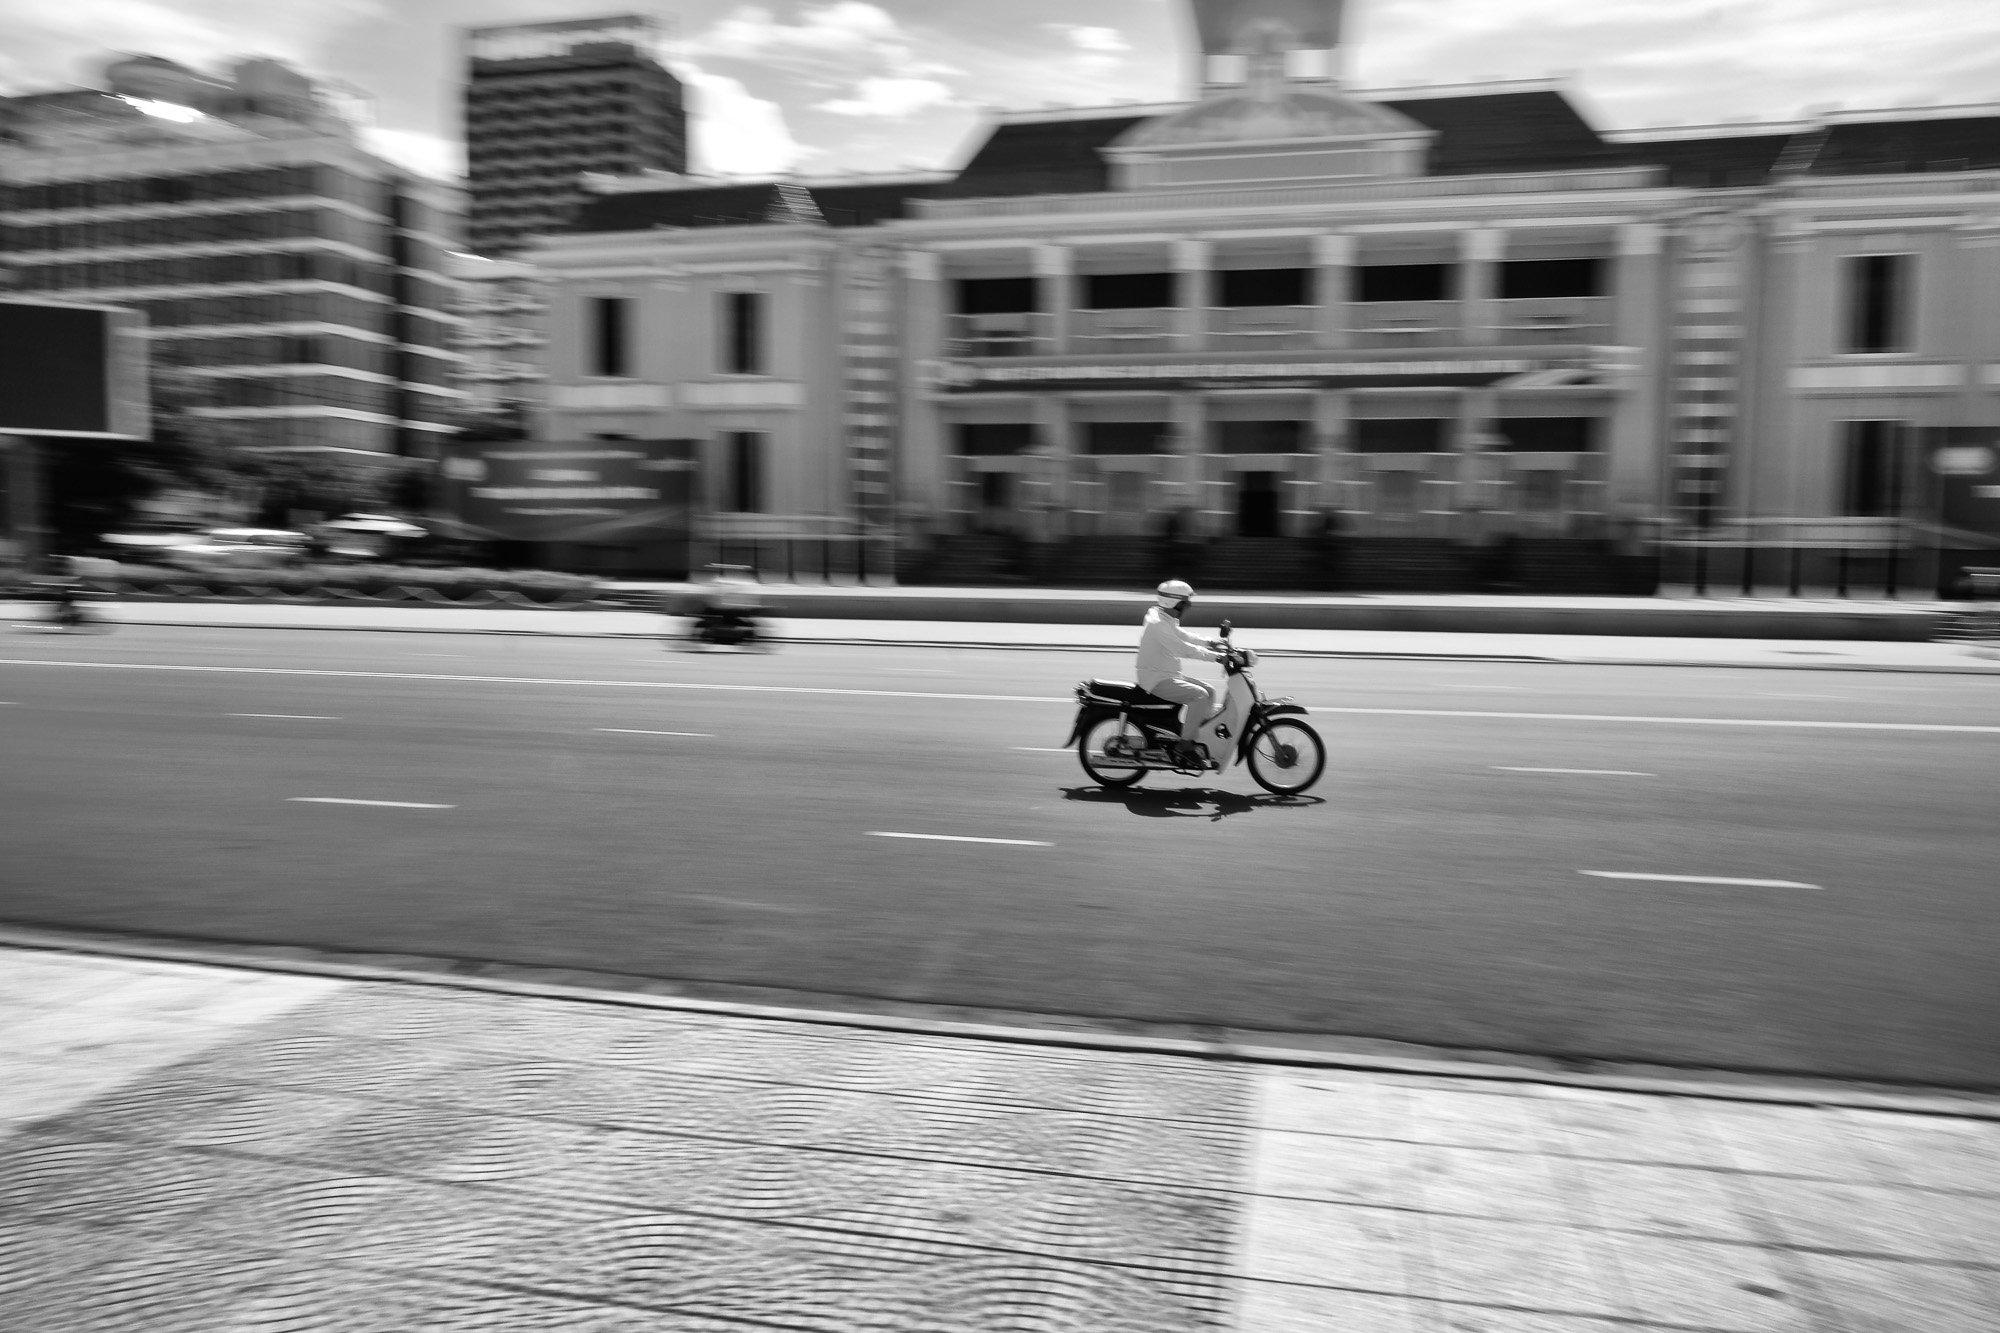 NHA TRANG vietnam asia street photography city scooter